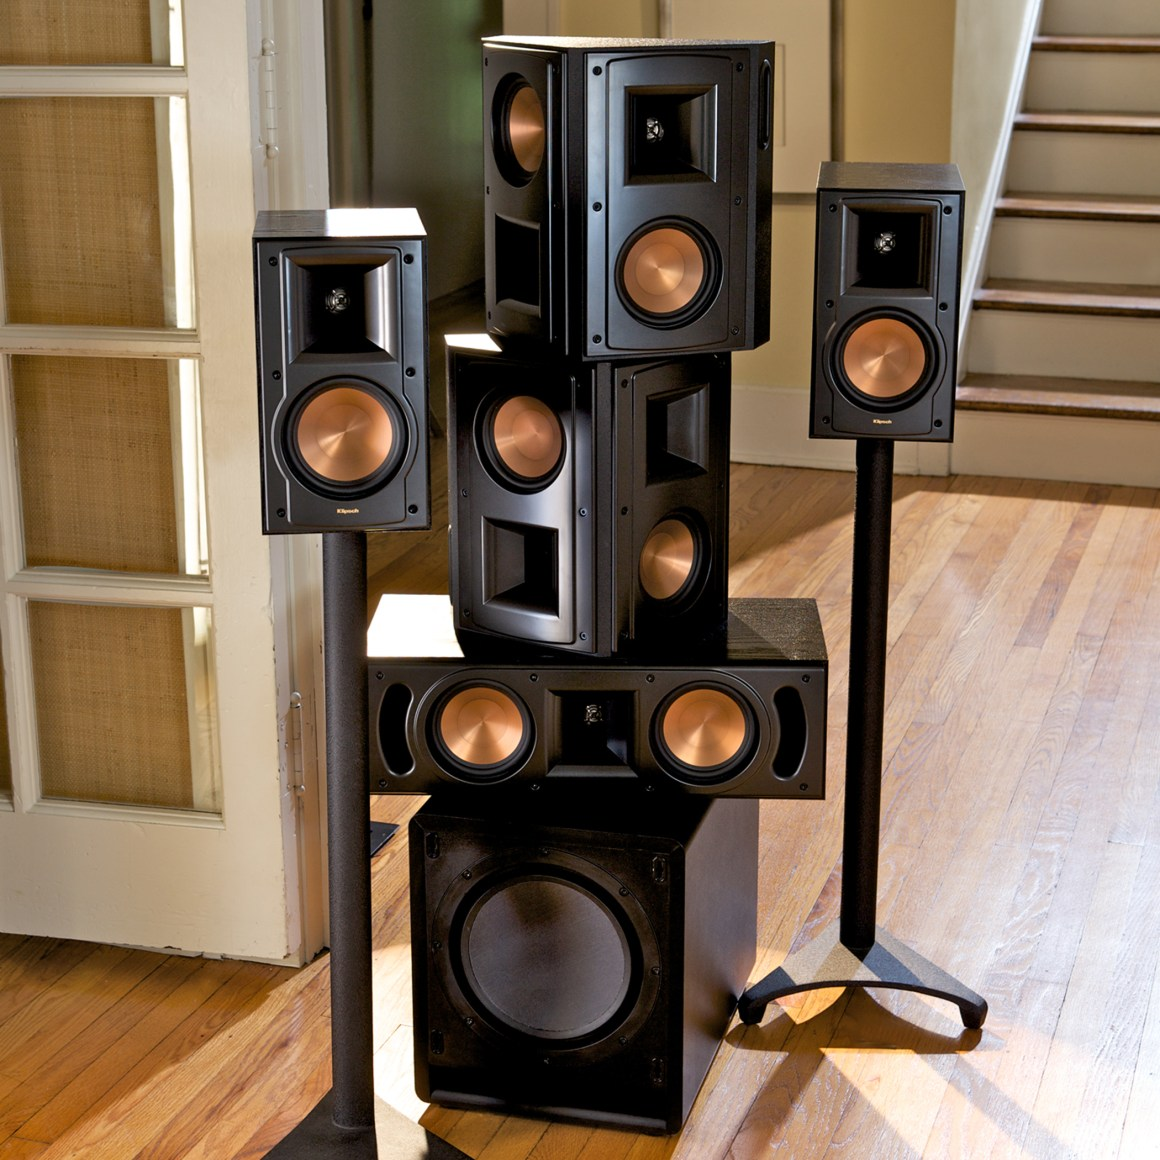 rb-51 ii bookshelf speakers (pair) | klipsch